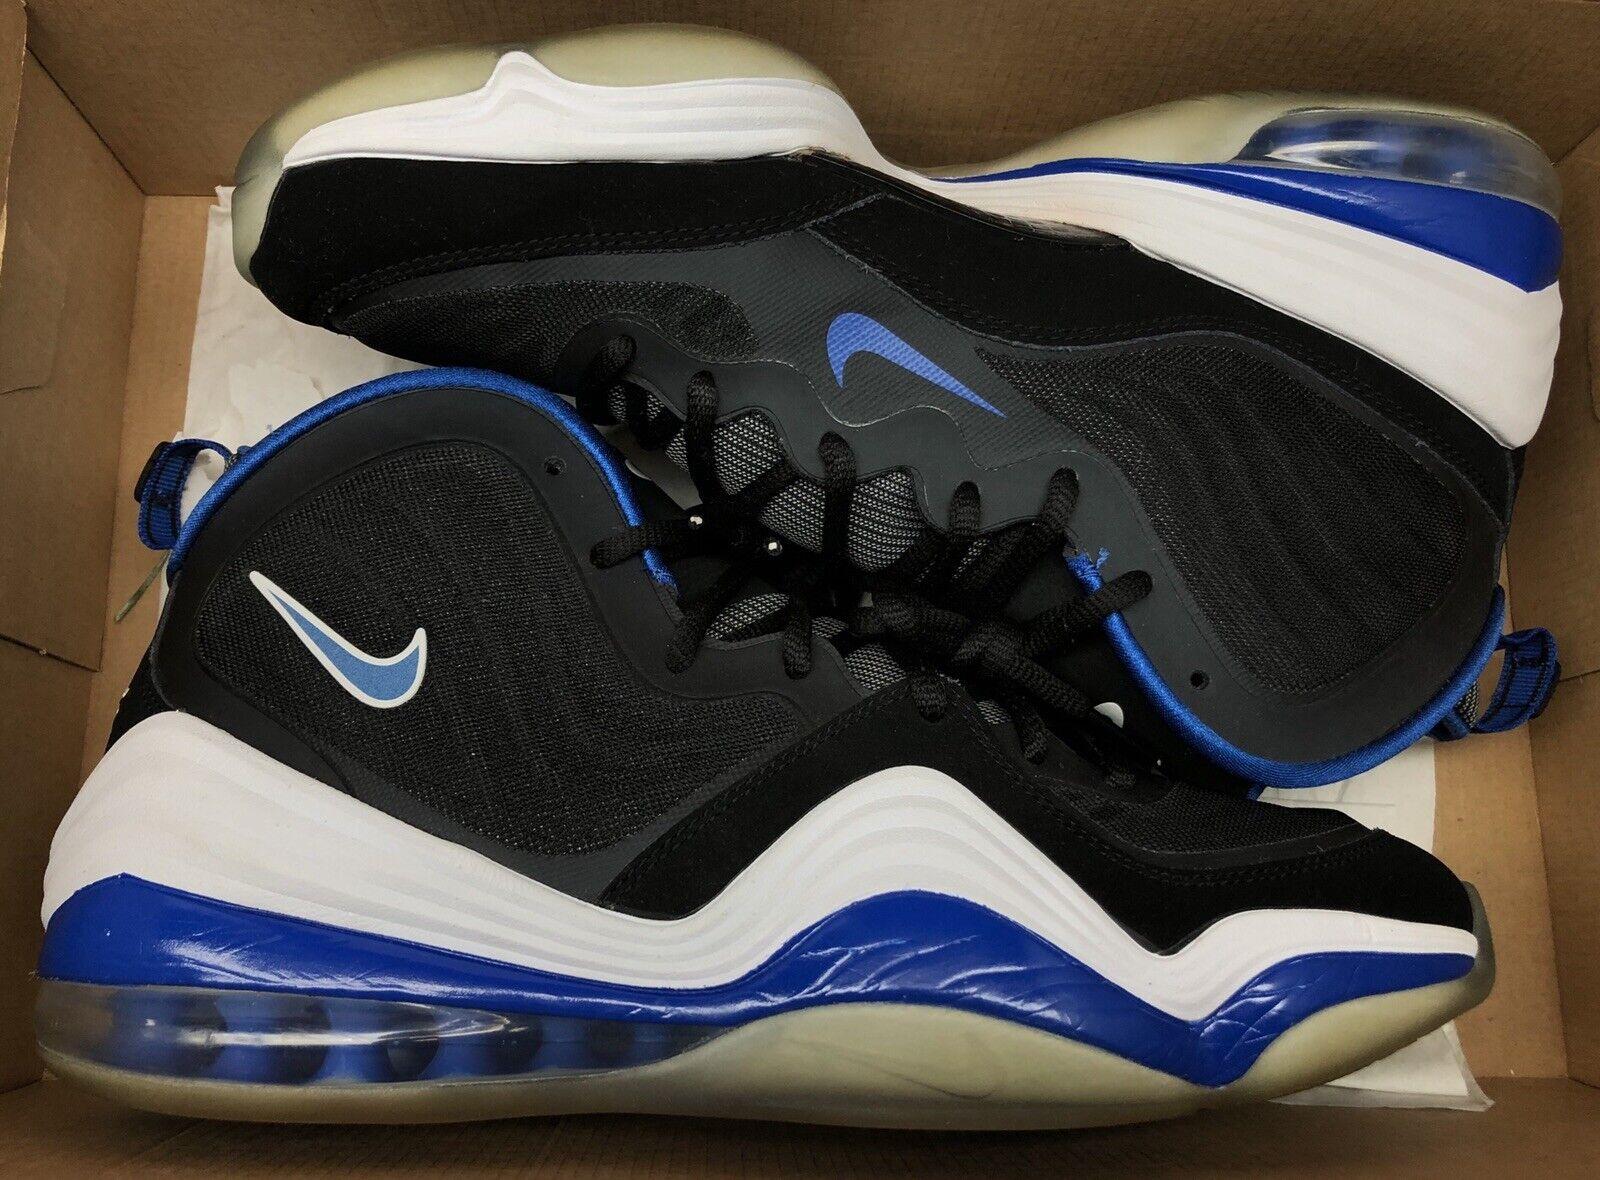 Nike Air Penny V 5 Black Game Royal White Orlando 537331-040 Sz 12